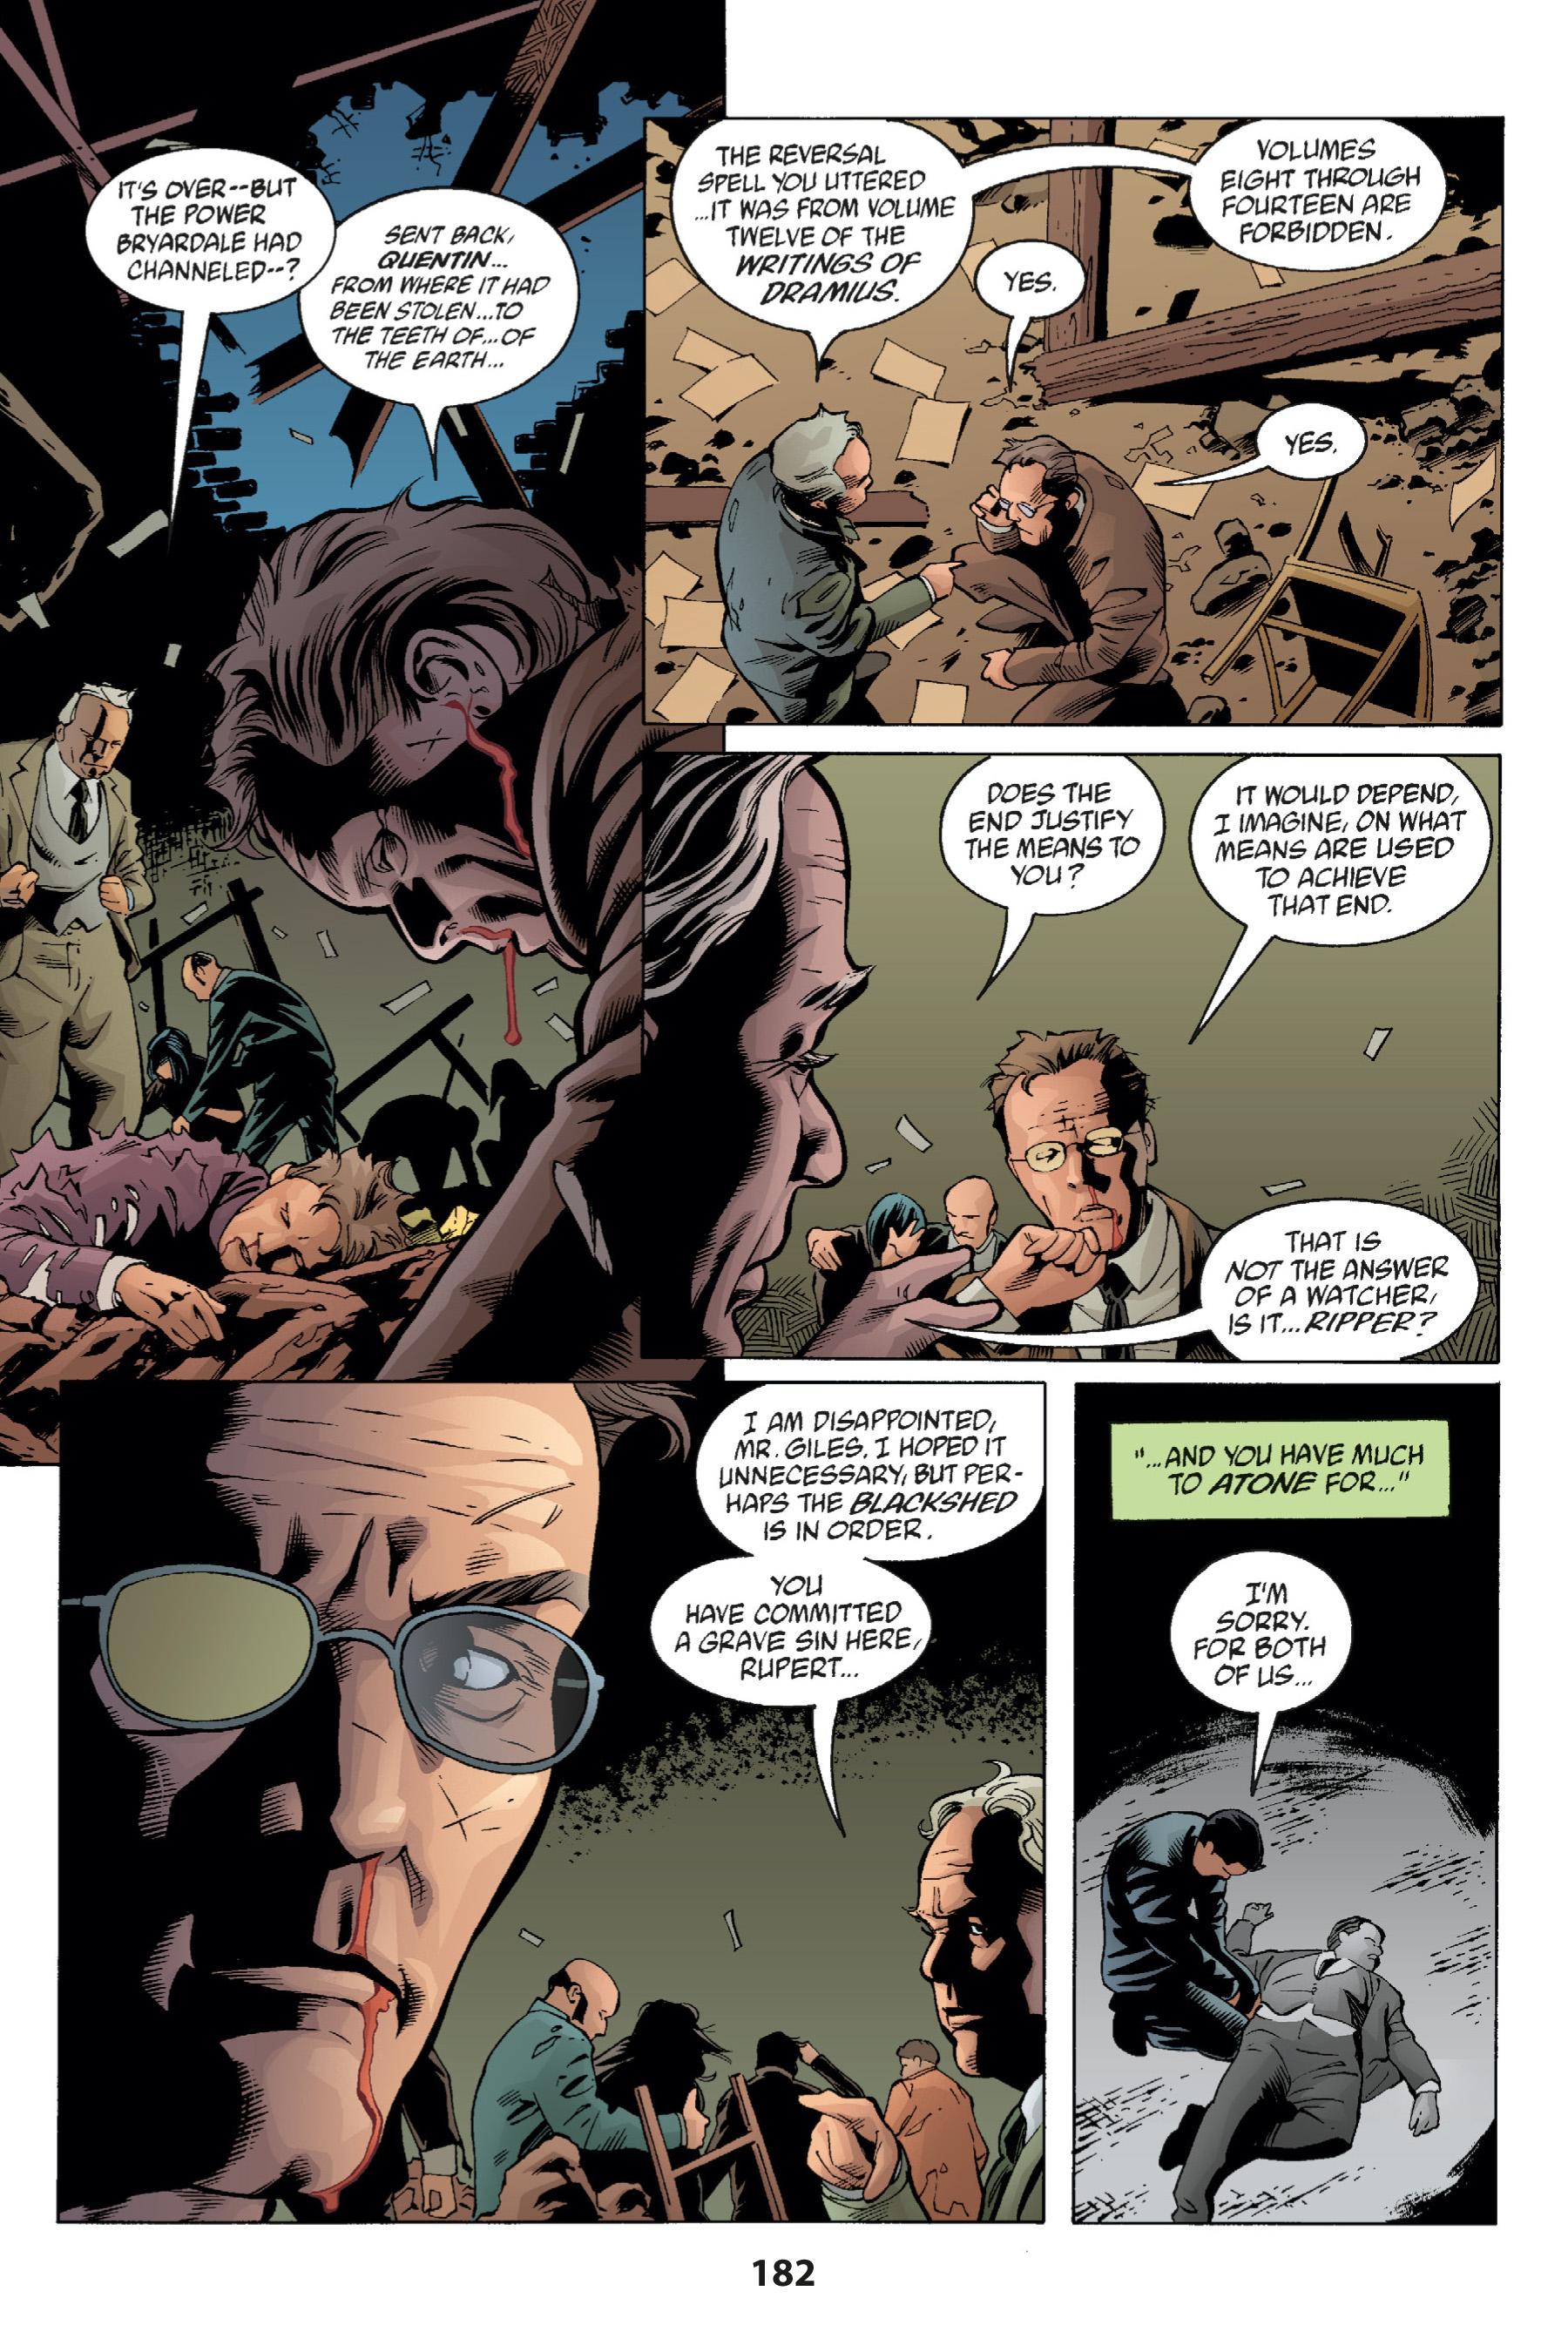 Read online Buffy the Vampire Slayer: Omnibus comic -  Issue # TPB 1 - 180